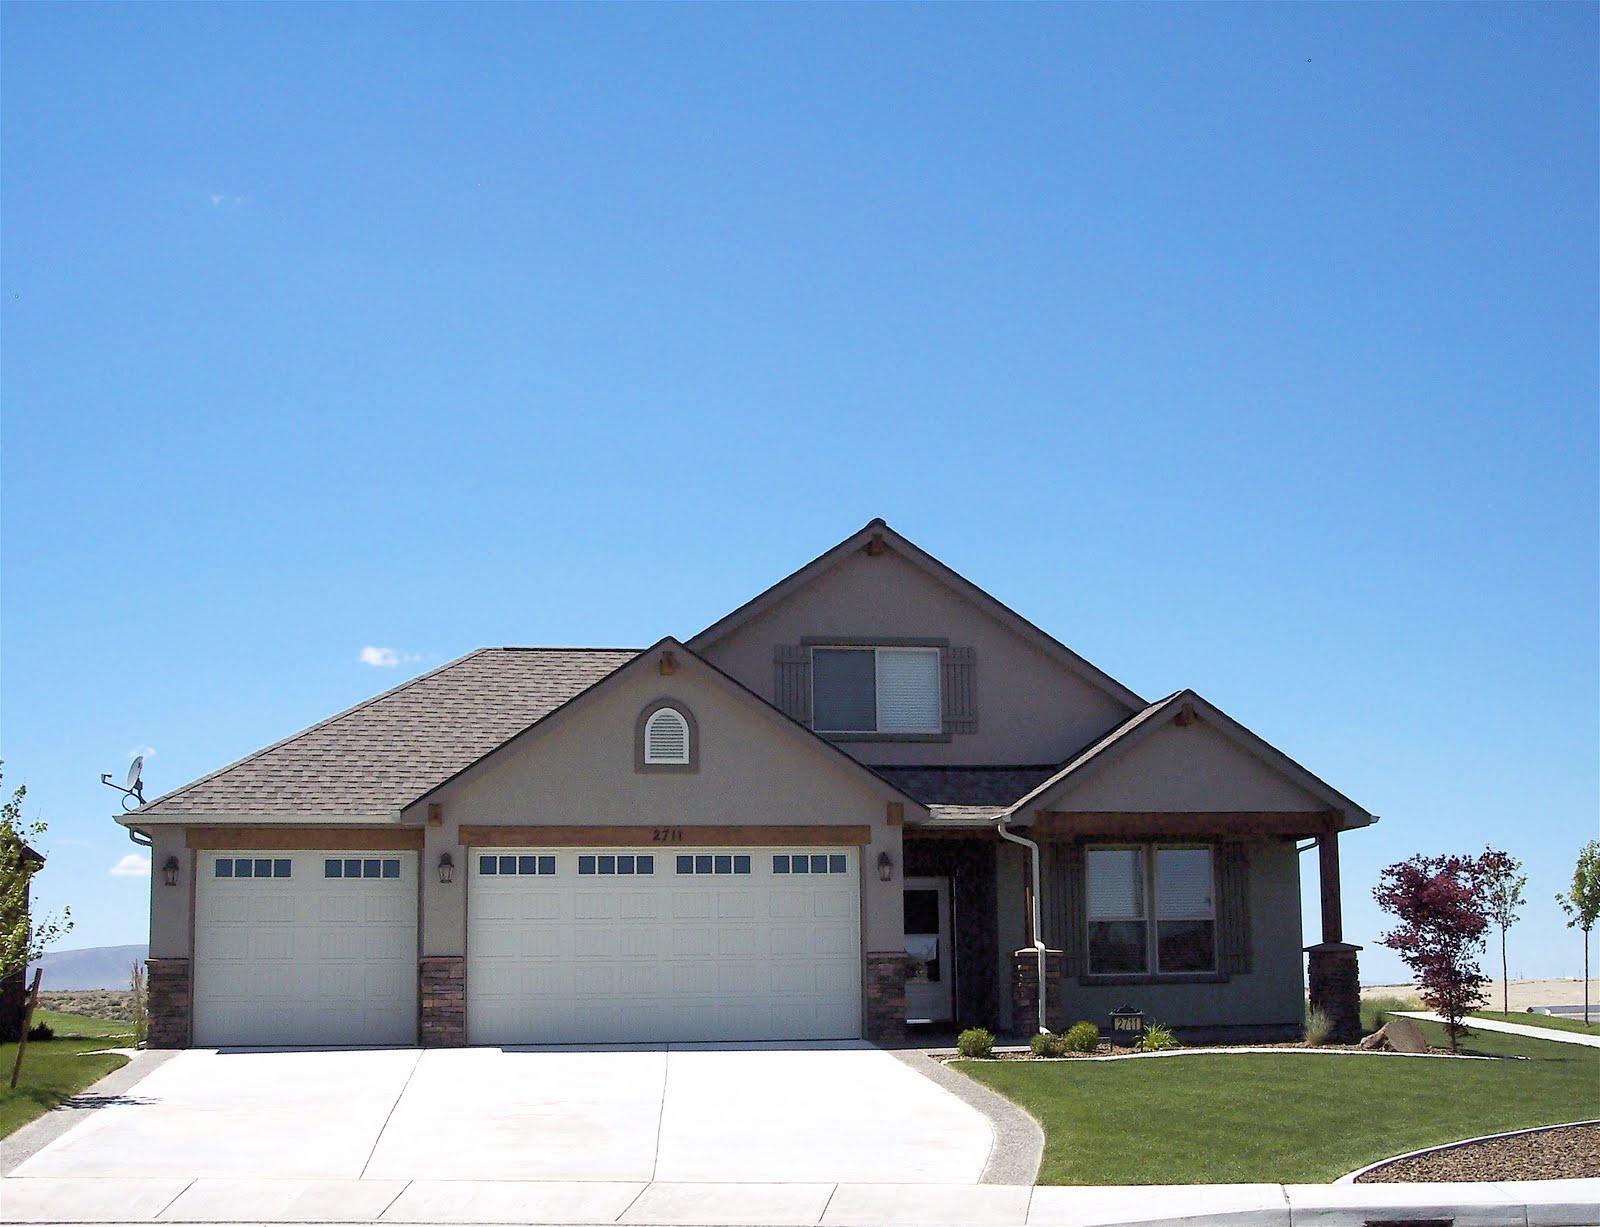 Building A Home Deciding On The Color Scheme For The Exterior